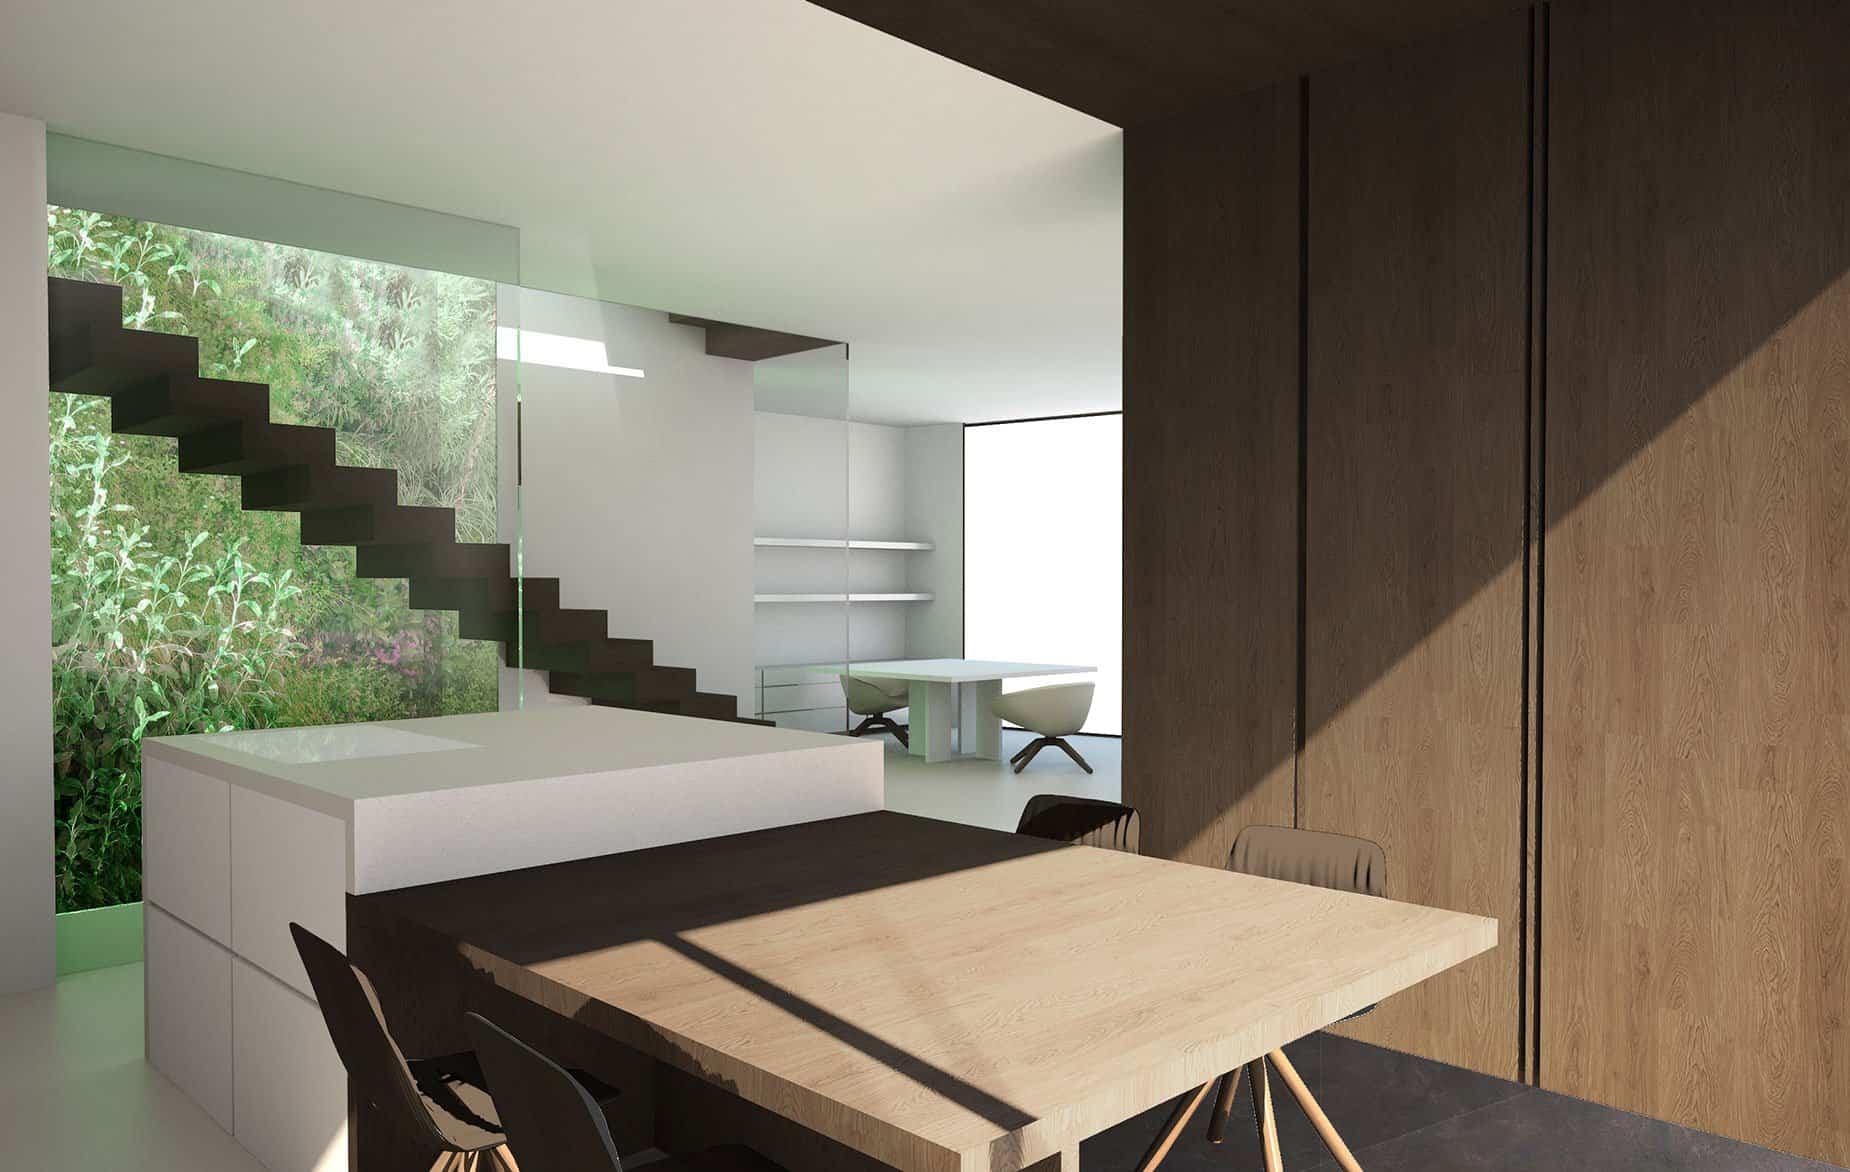 arquitectura cultivada 10